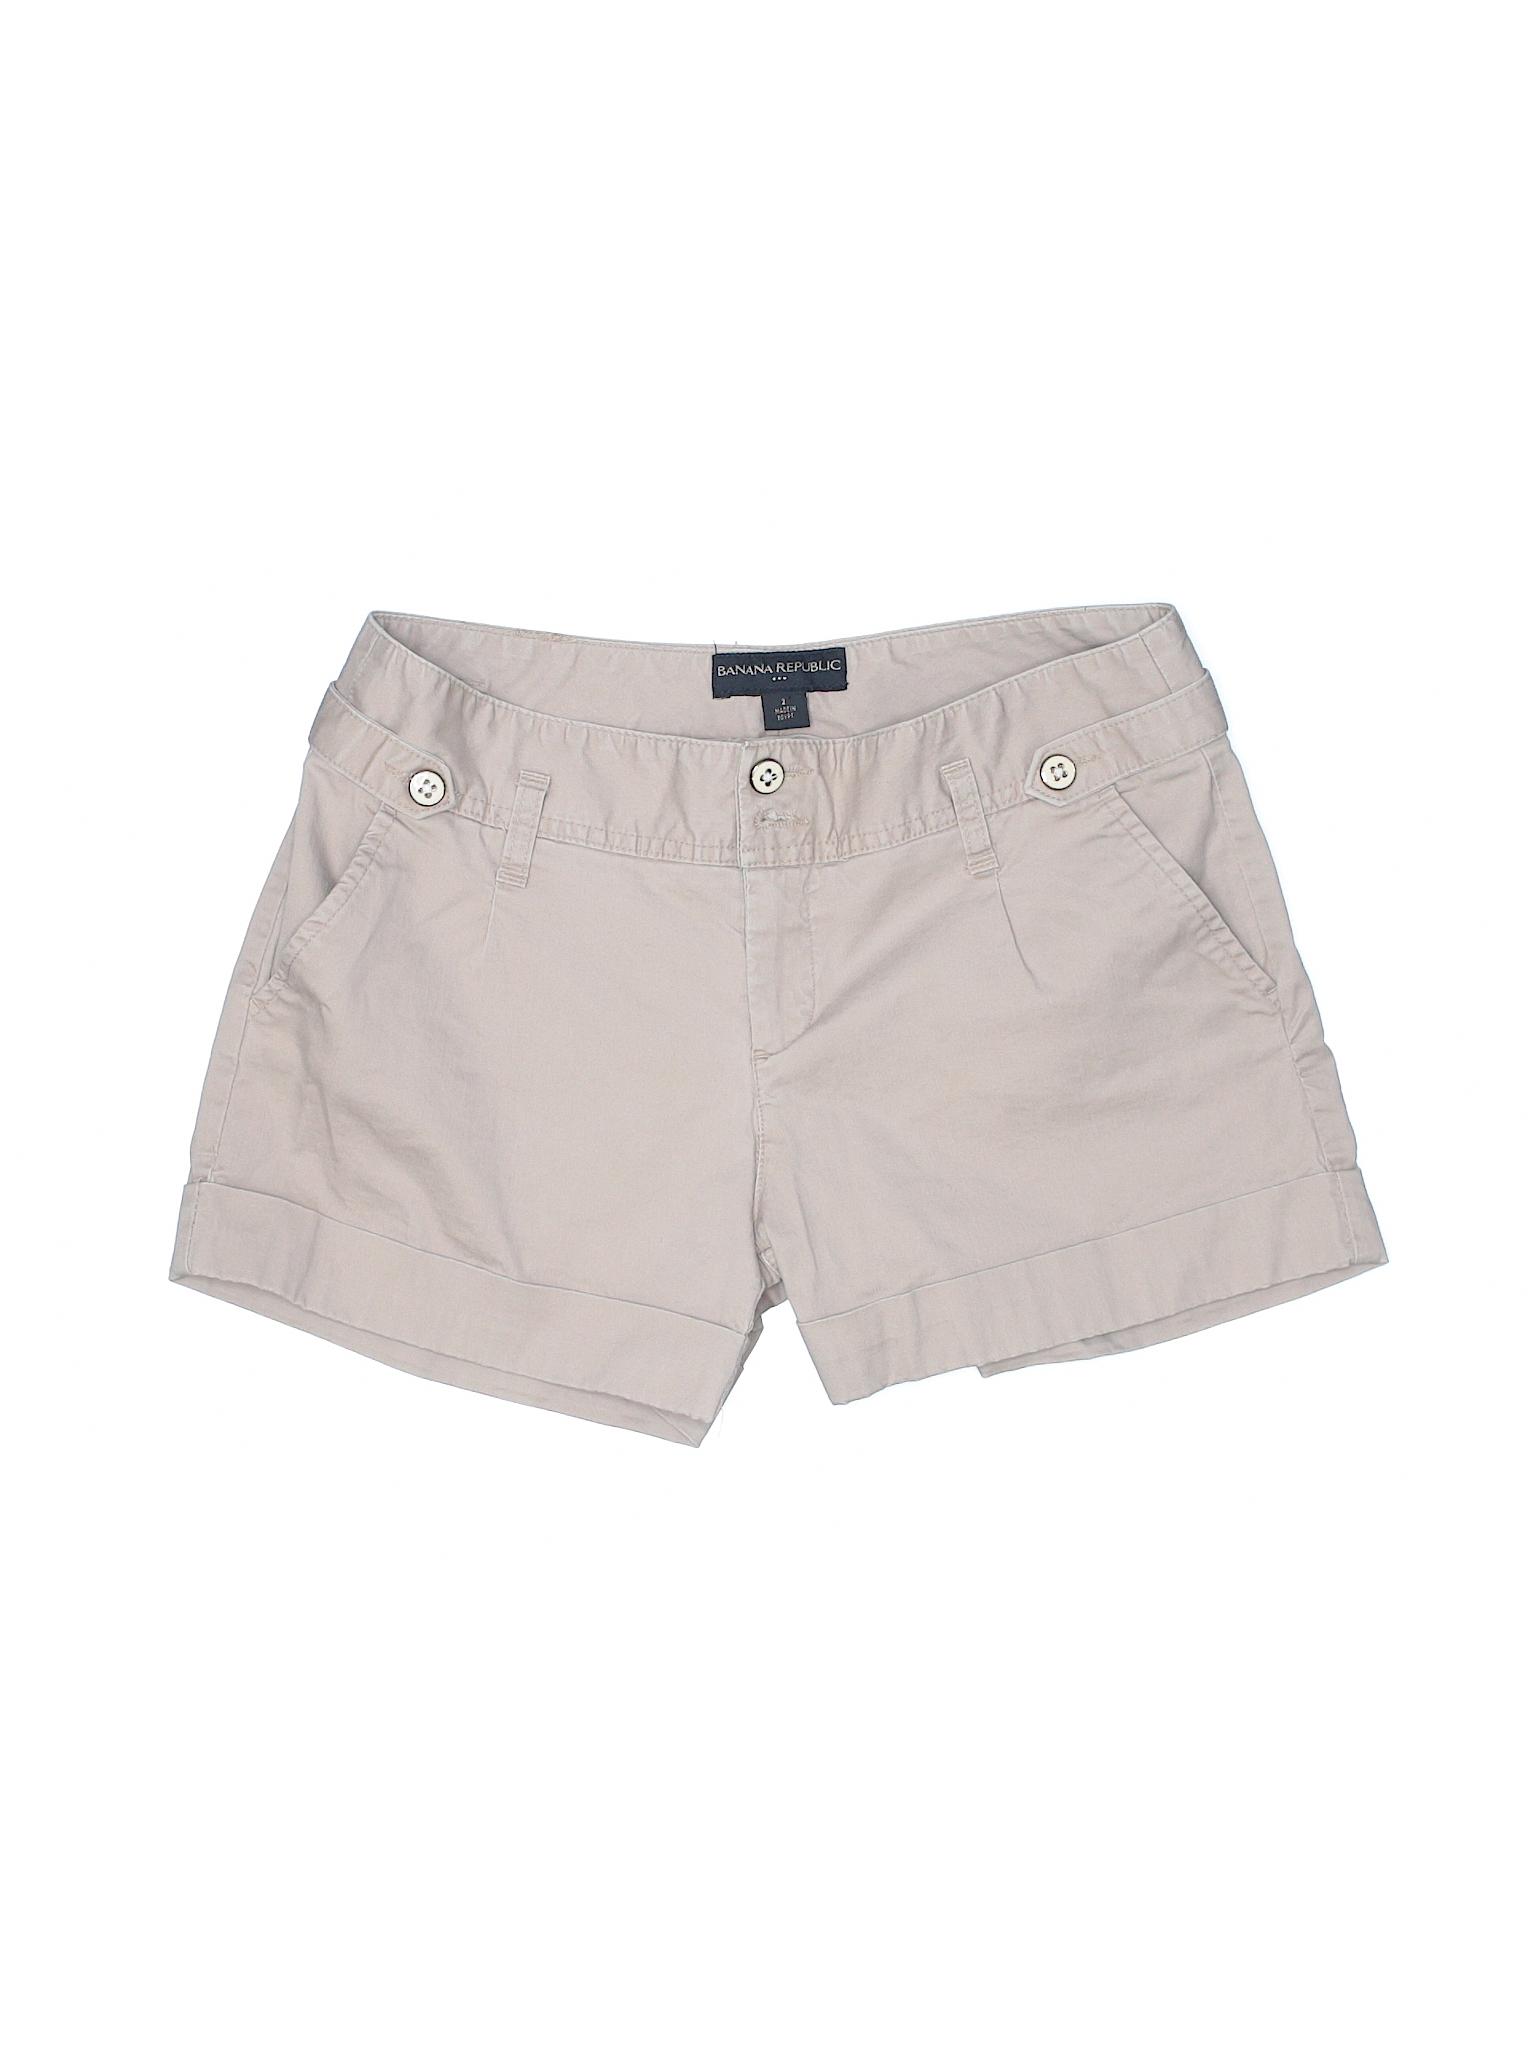 Shorts Republic Banana Store Factory Khaki Boutique qSXZ7w5